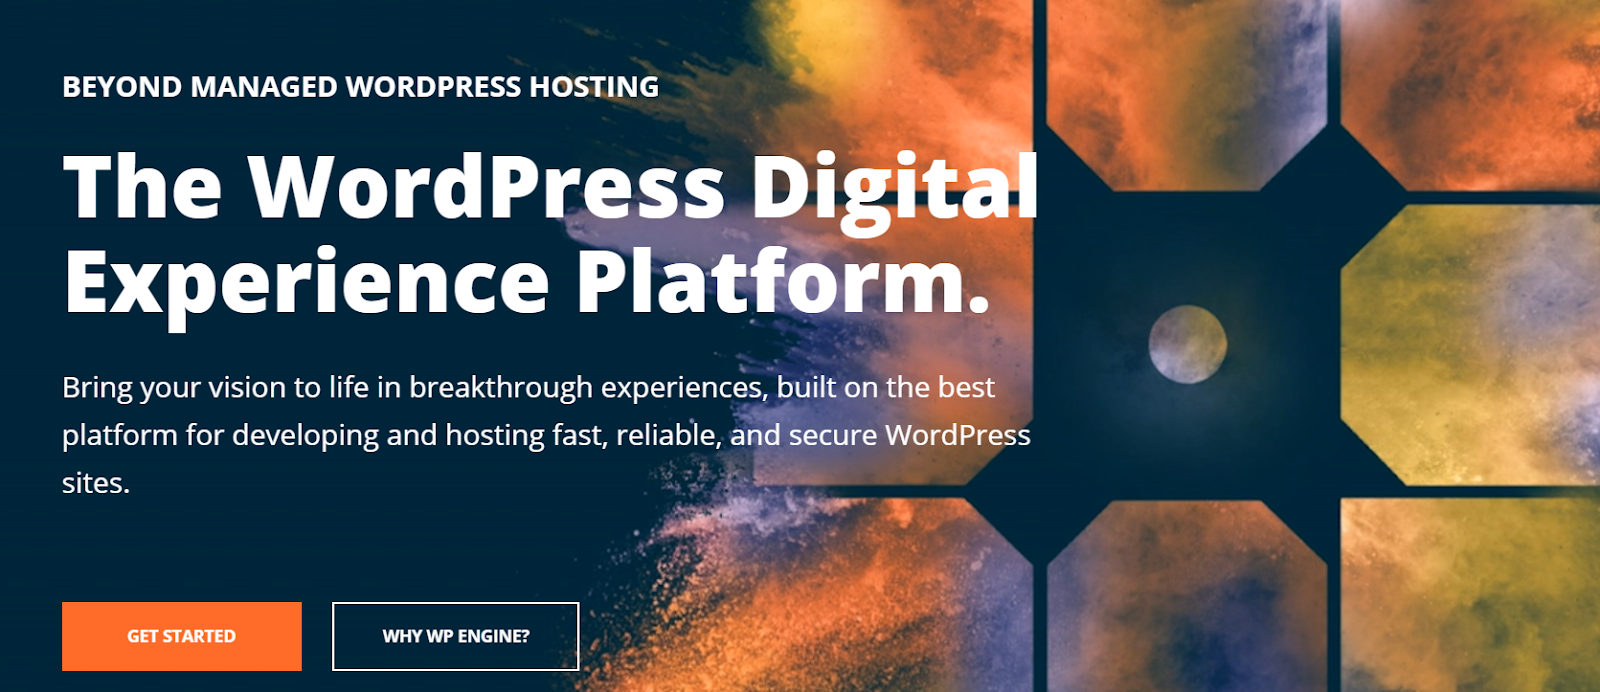 screenshot of wpengine hosting platform